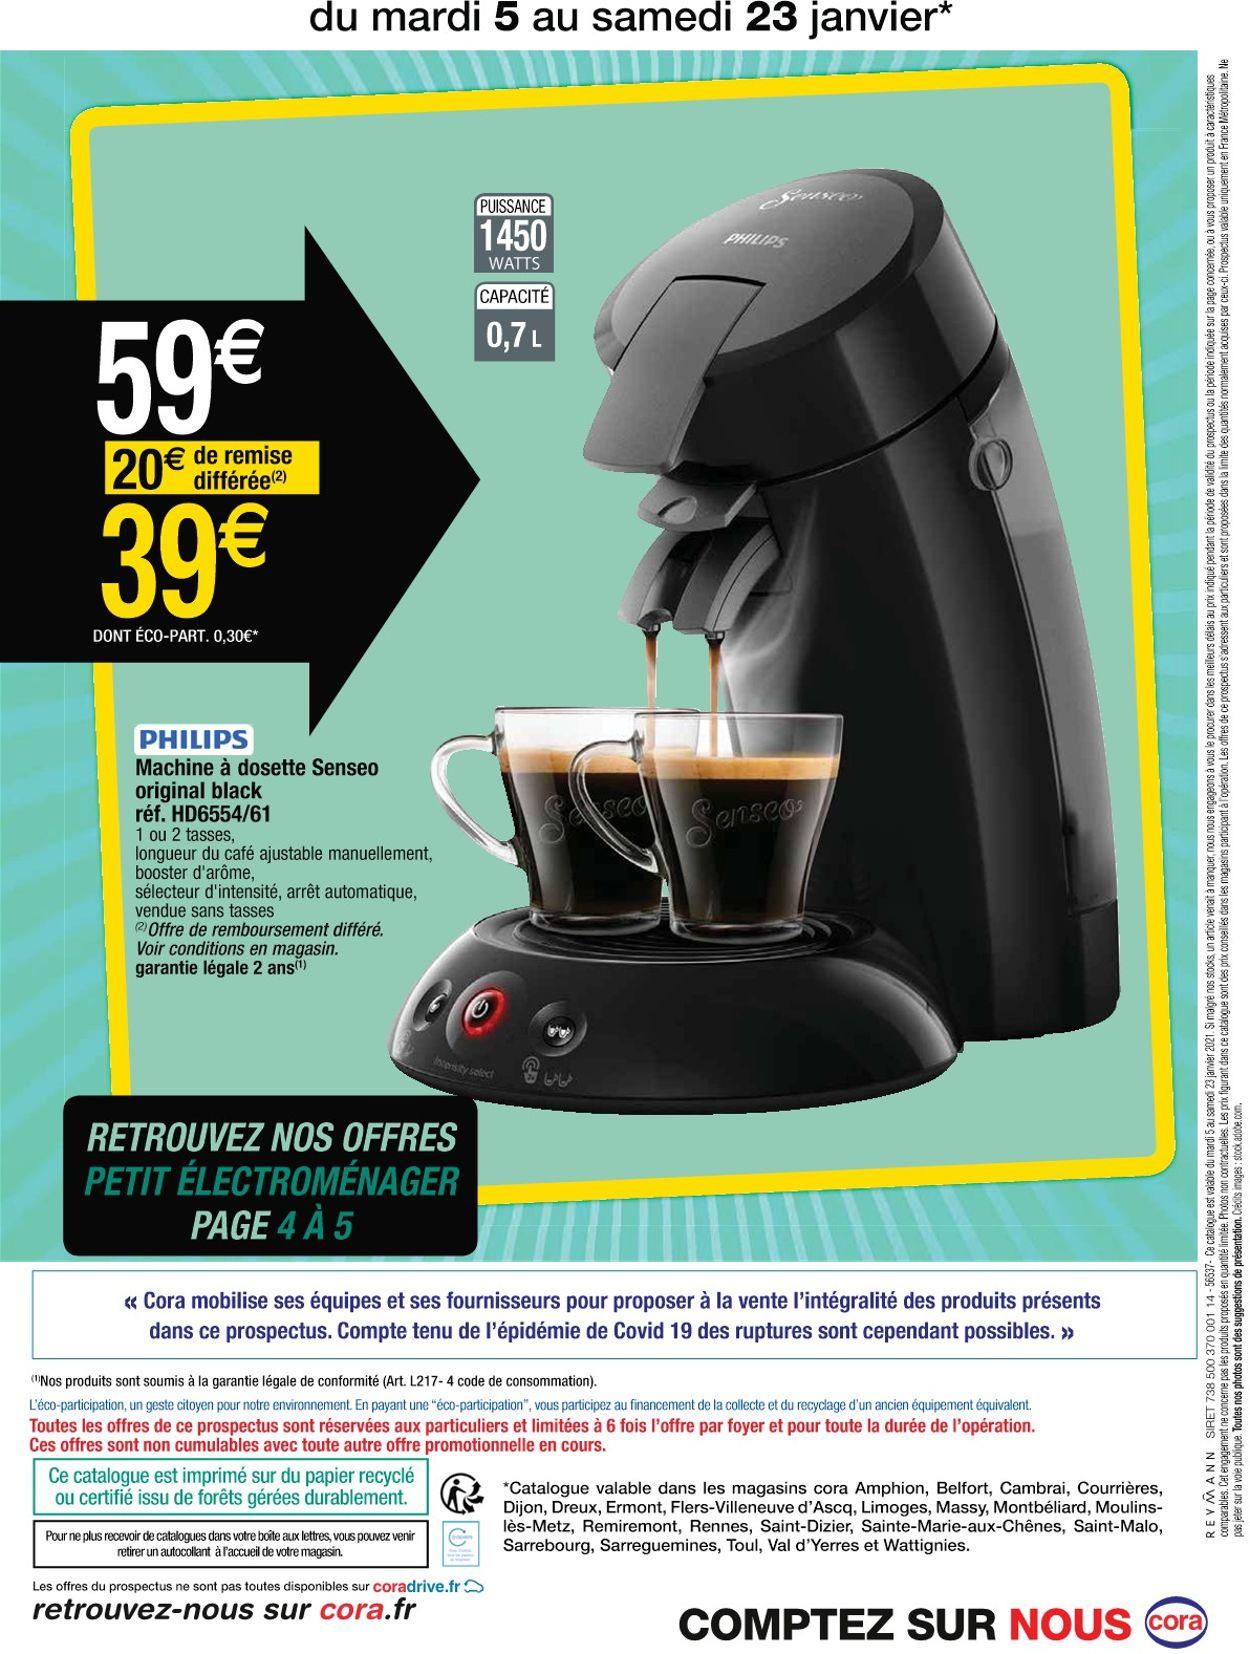 Cora Les arts ménagers 2021 Catalogue - 05.01-23.01.2021 (Page 8)